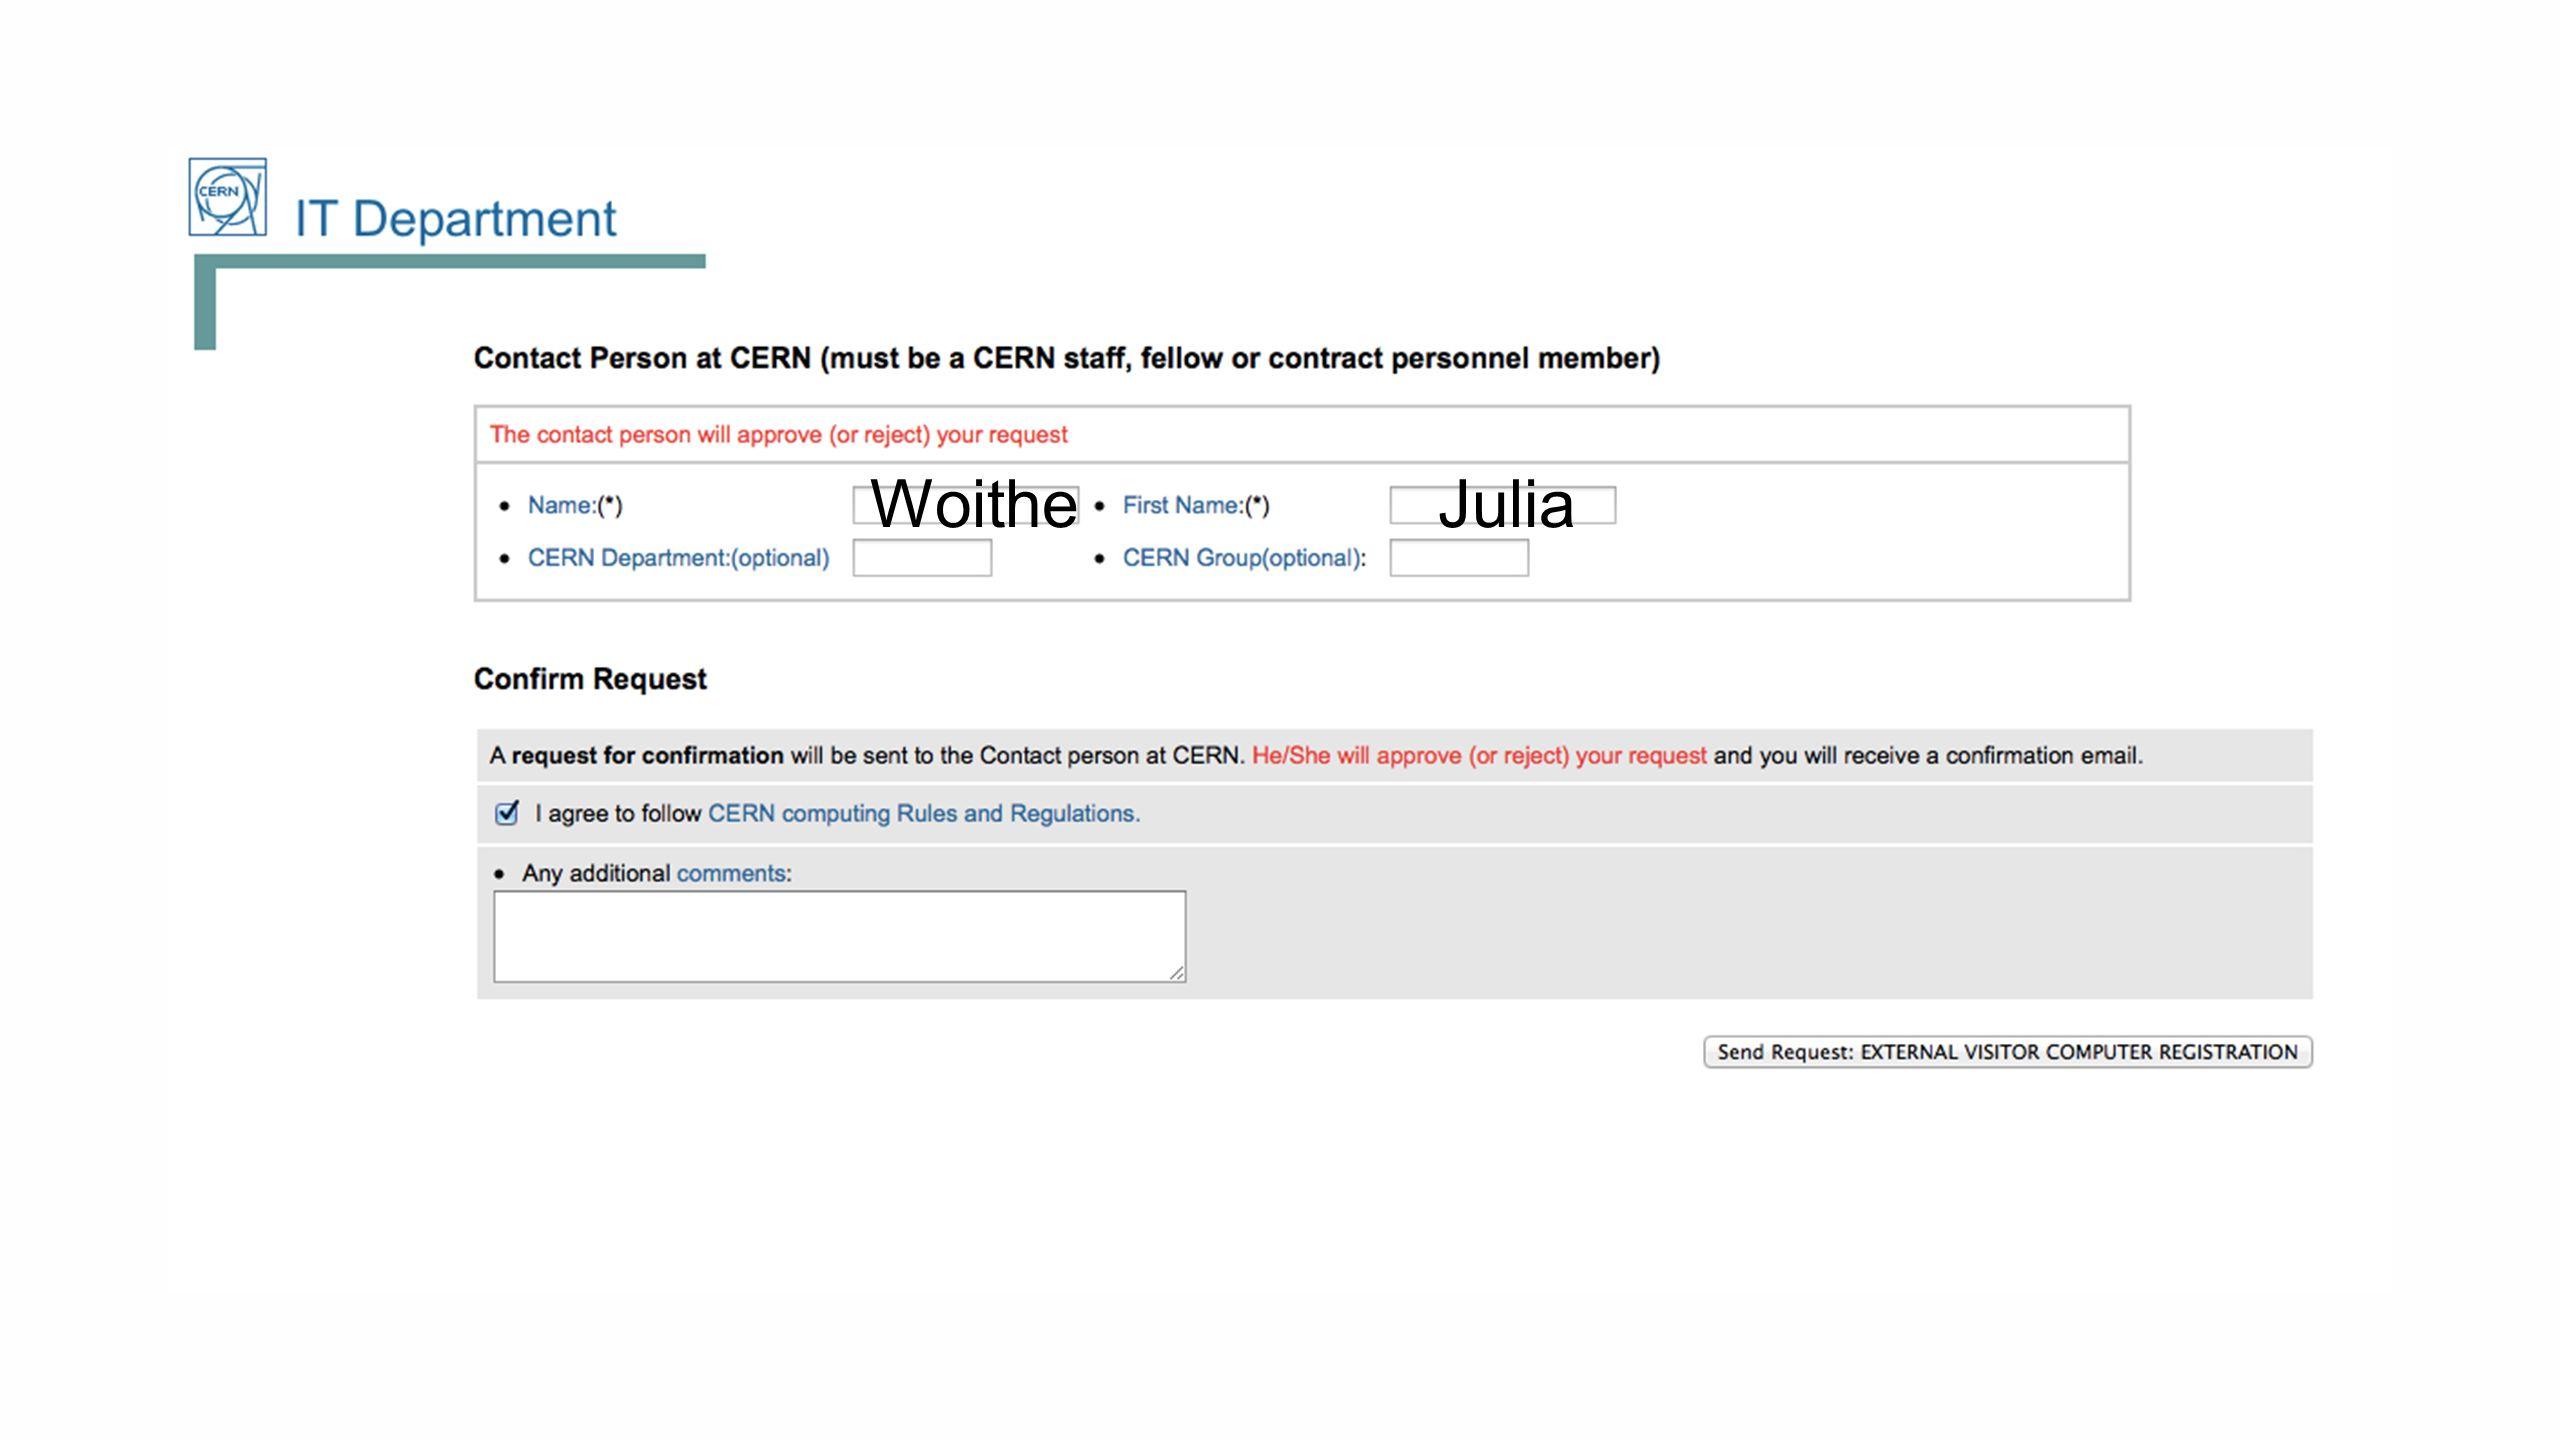 WoitheJulia